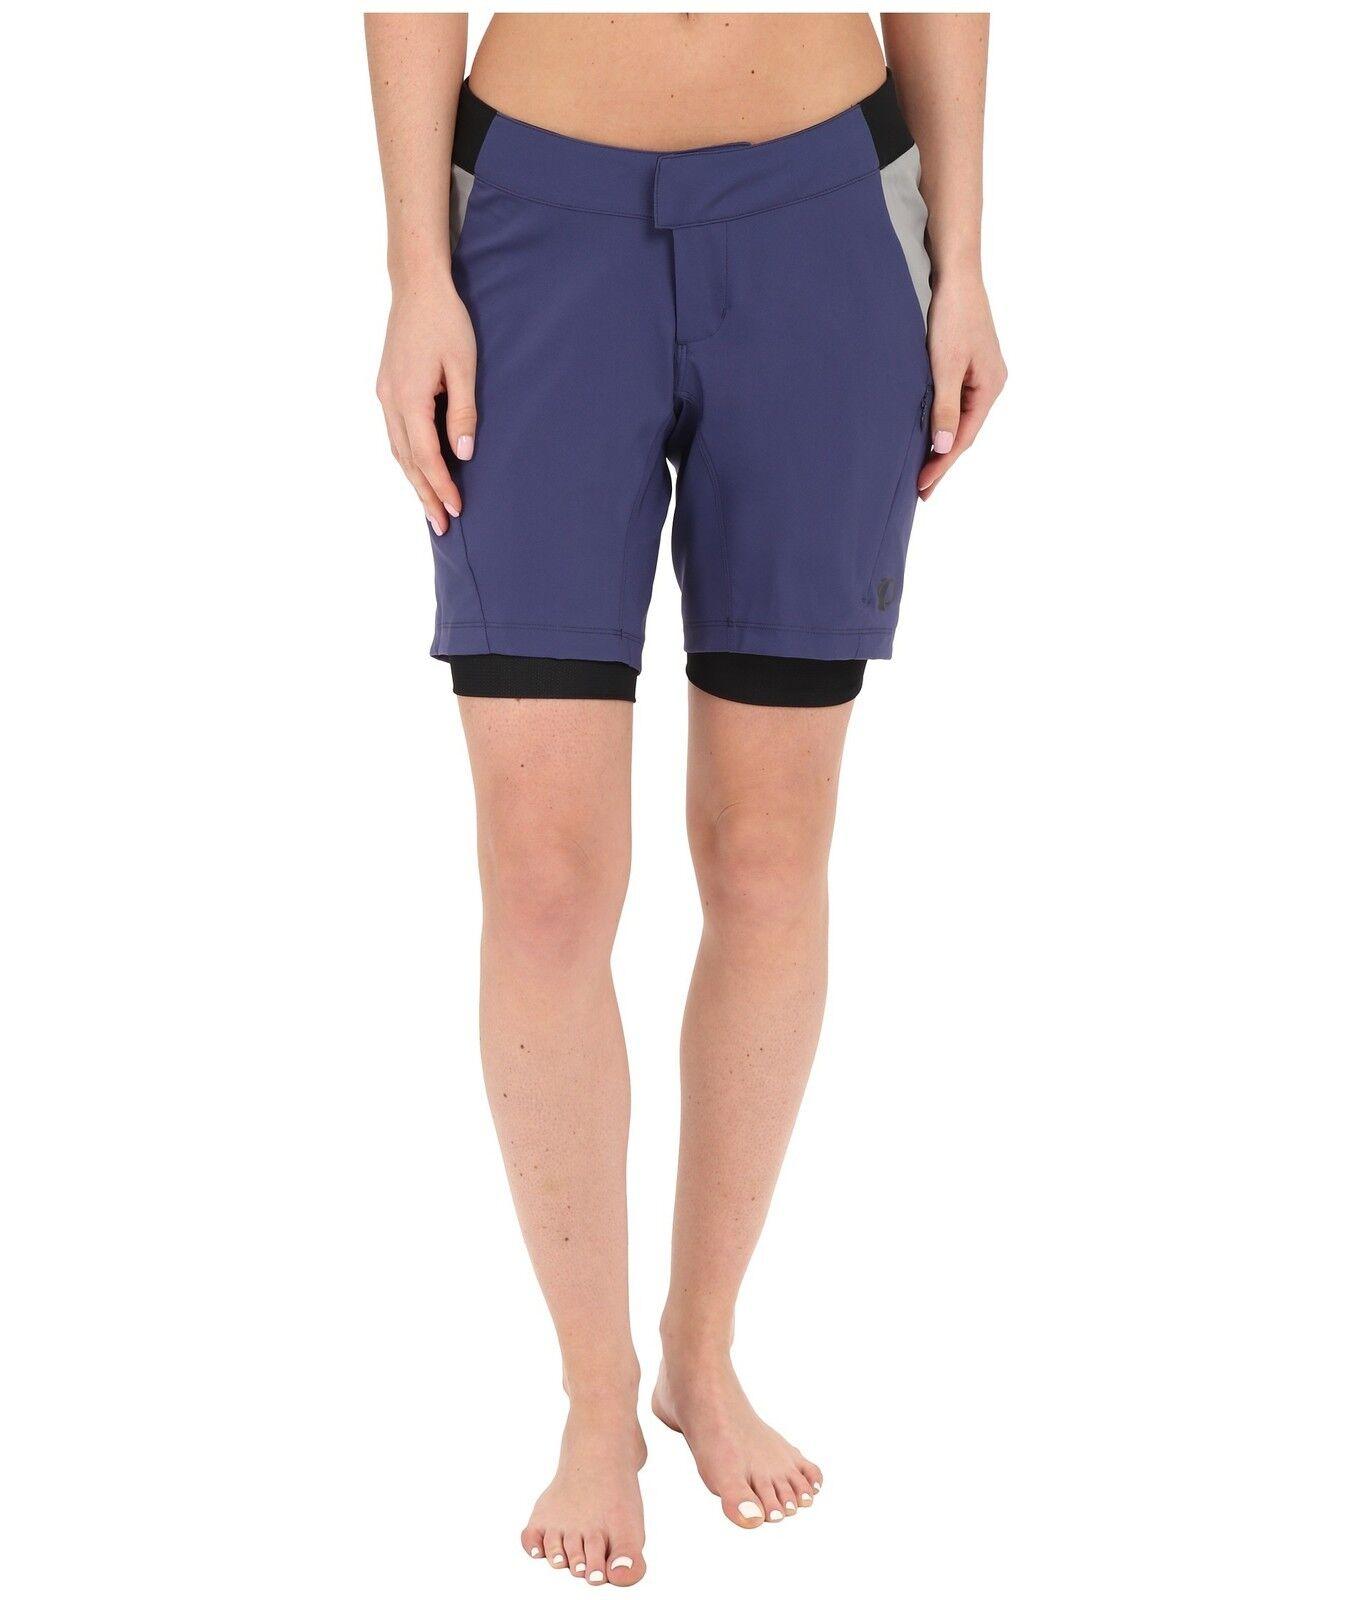 Pearl Izumi Canyon Short Women's Shorts  NEW size medium